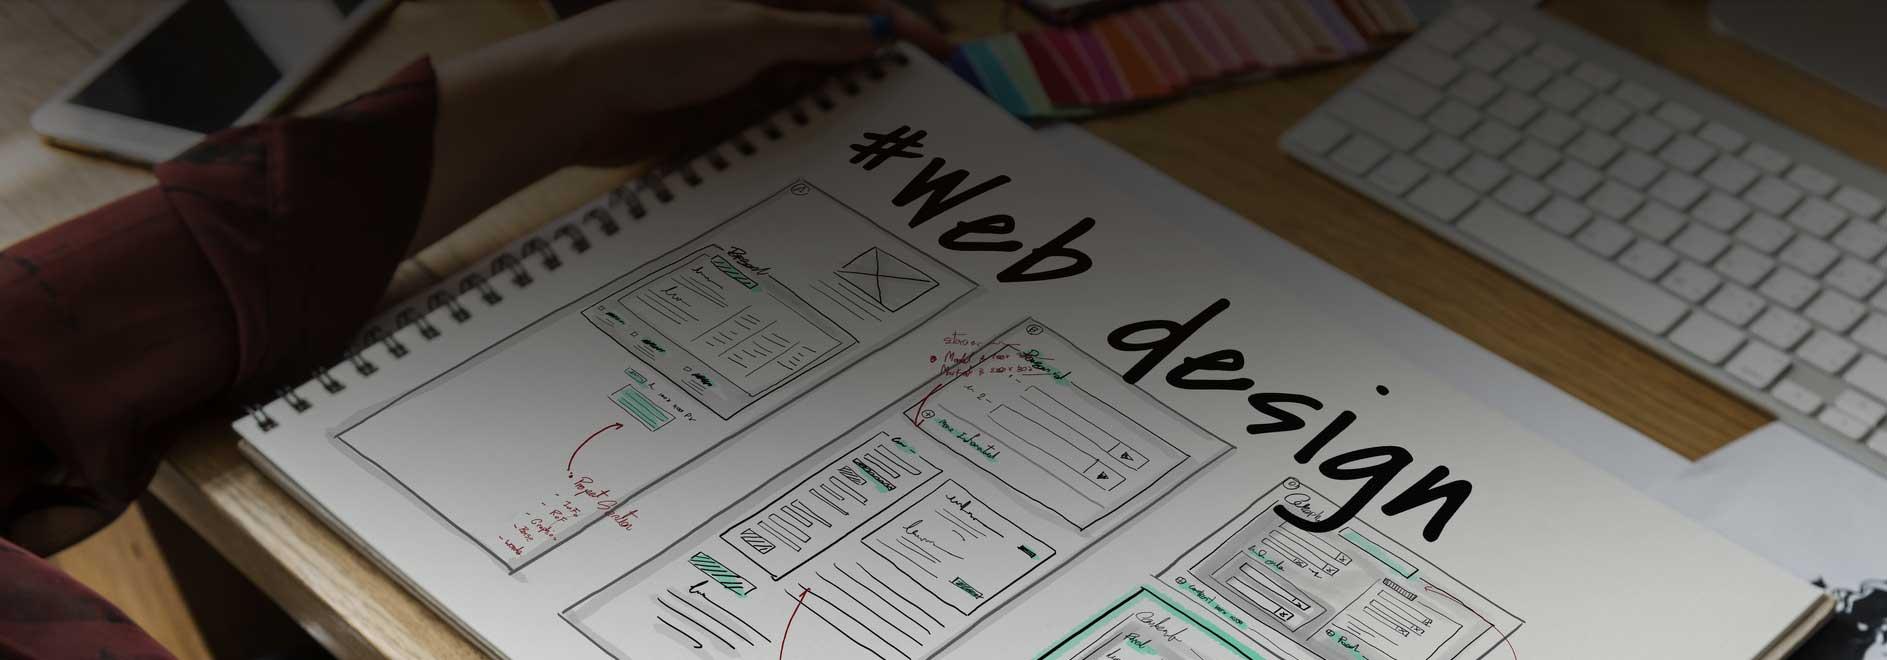 Web Design West Virginia